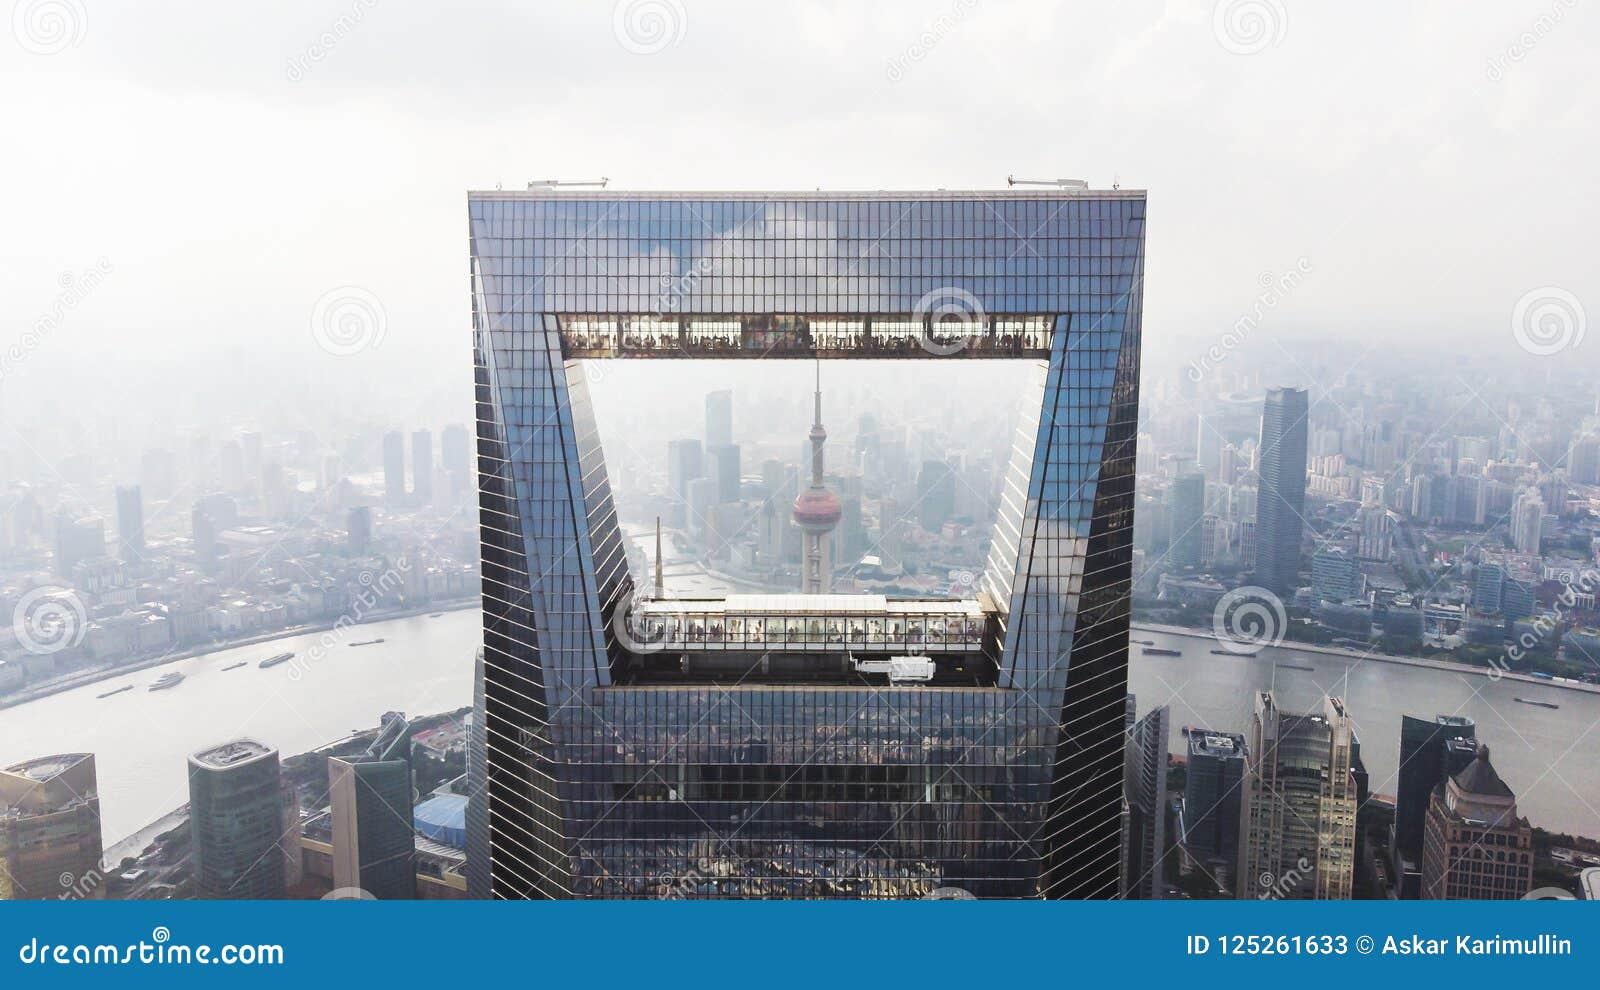 Capture Of Shanghai Skyline. Shanghai World Financial Center, Pearl Tower, Hungpu River And Bund